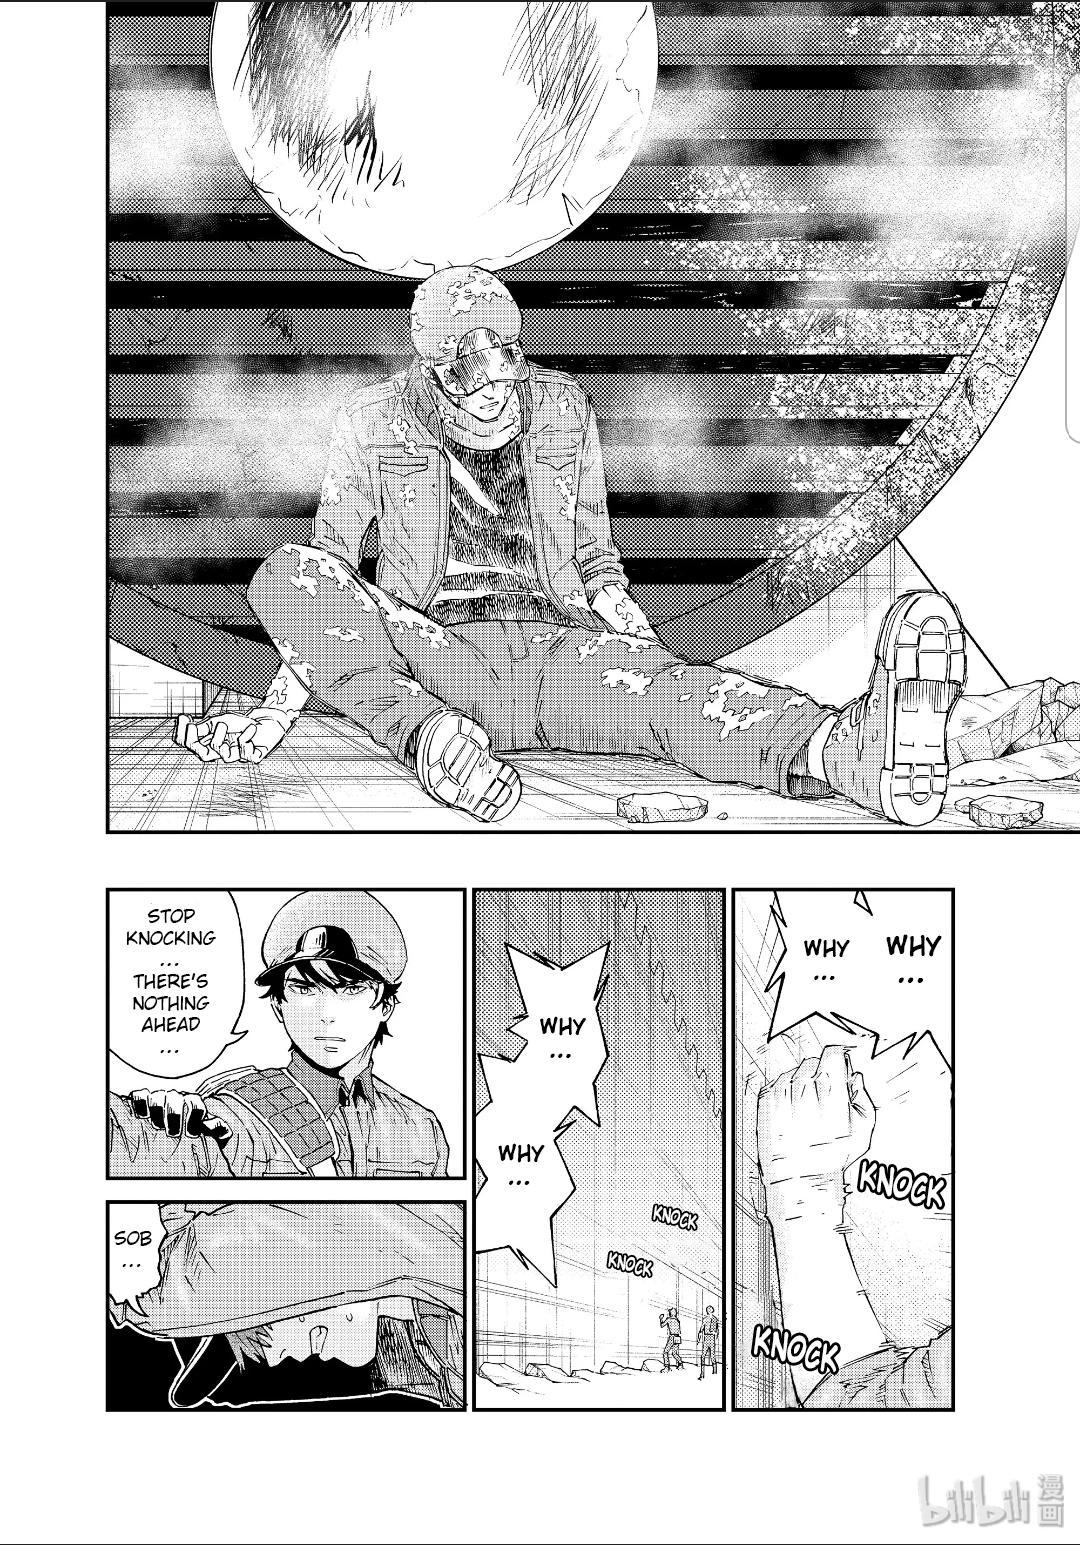 Hataraku Saibou Black Vol.7 Chapter 39 page 12 - Mangakakalots.com